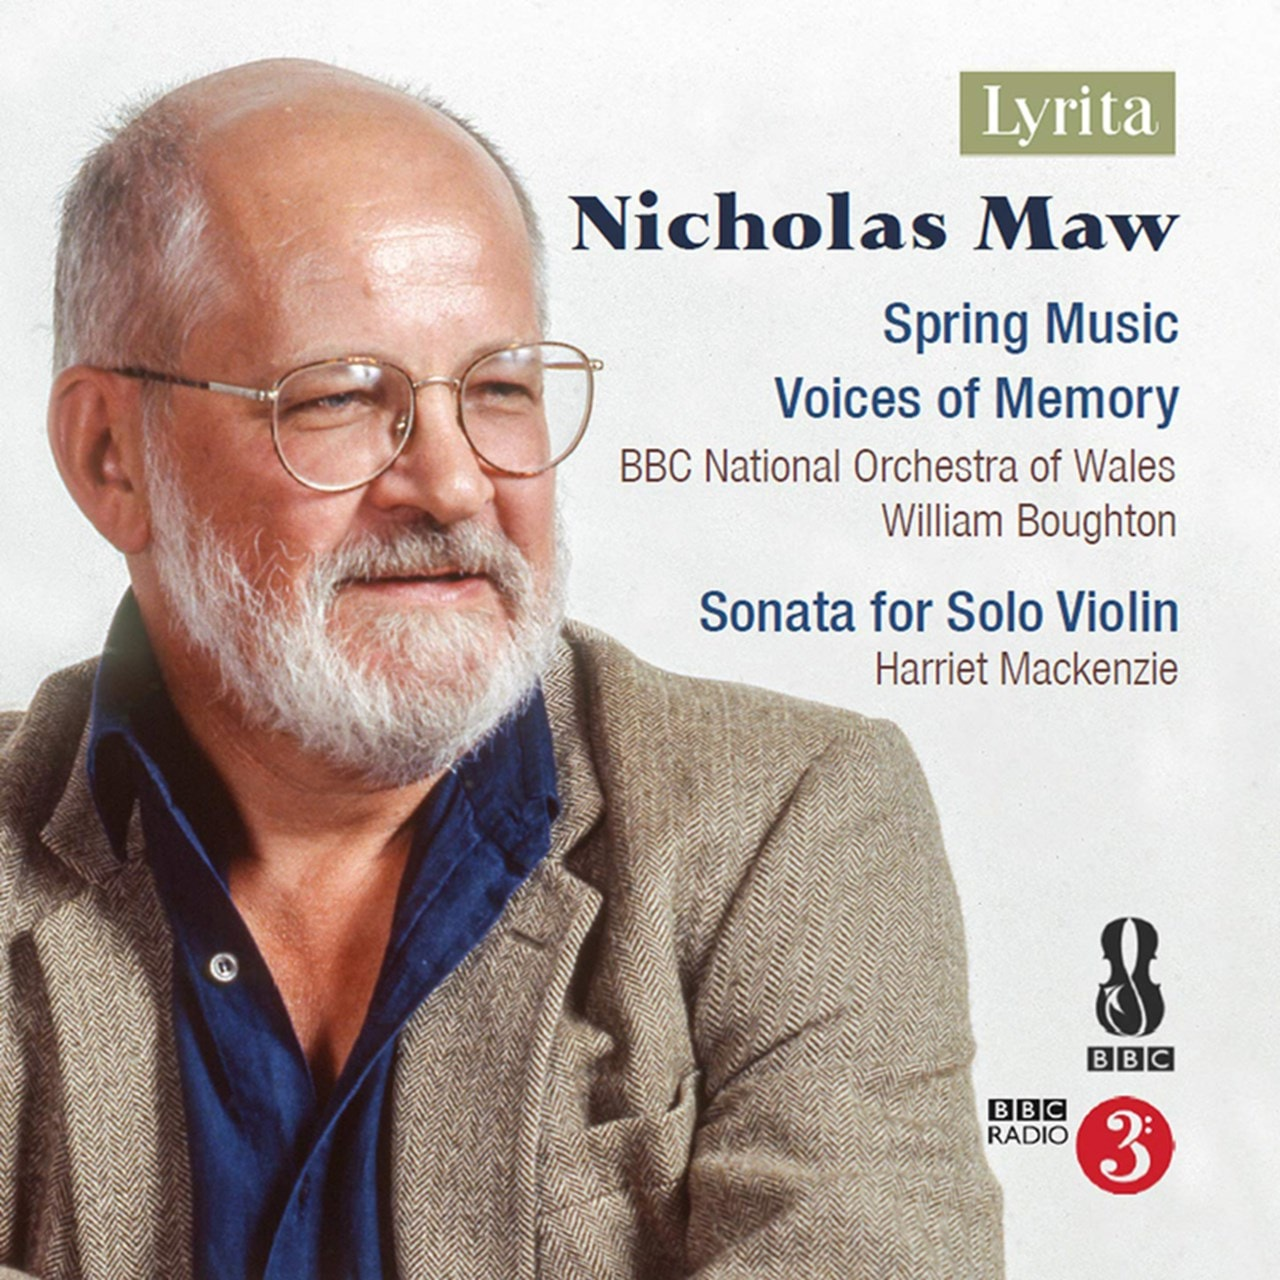 Nicholas Maw: Spring Music/Voices of Memory - 1